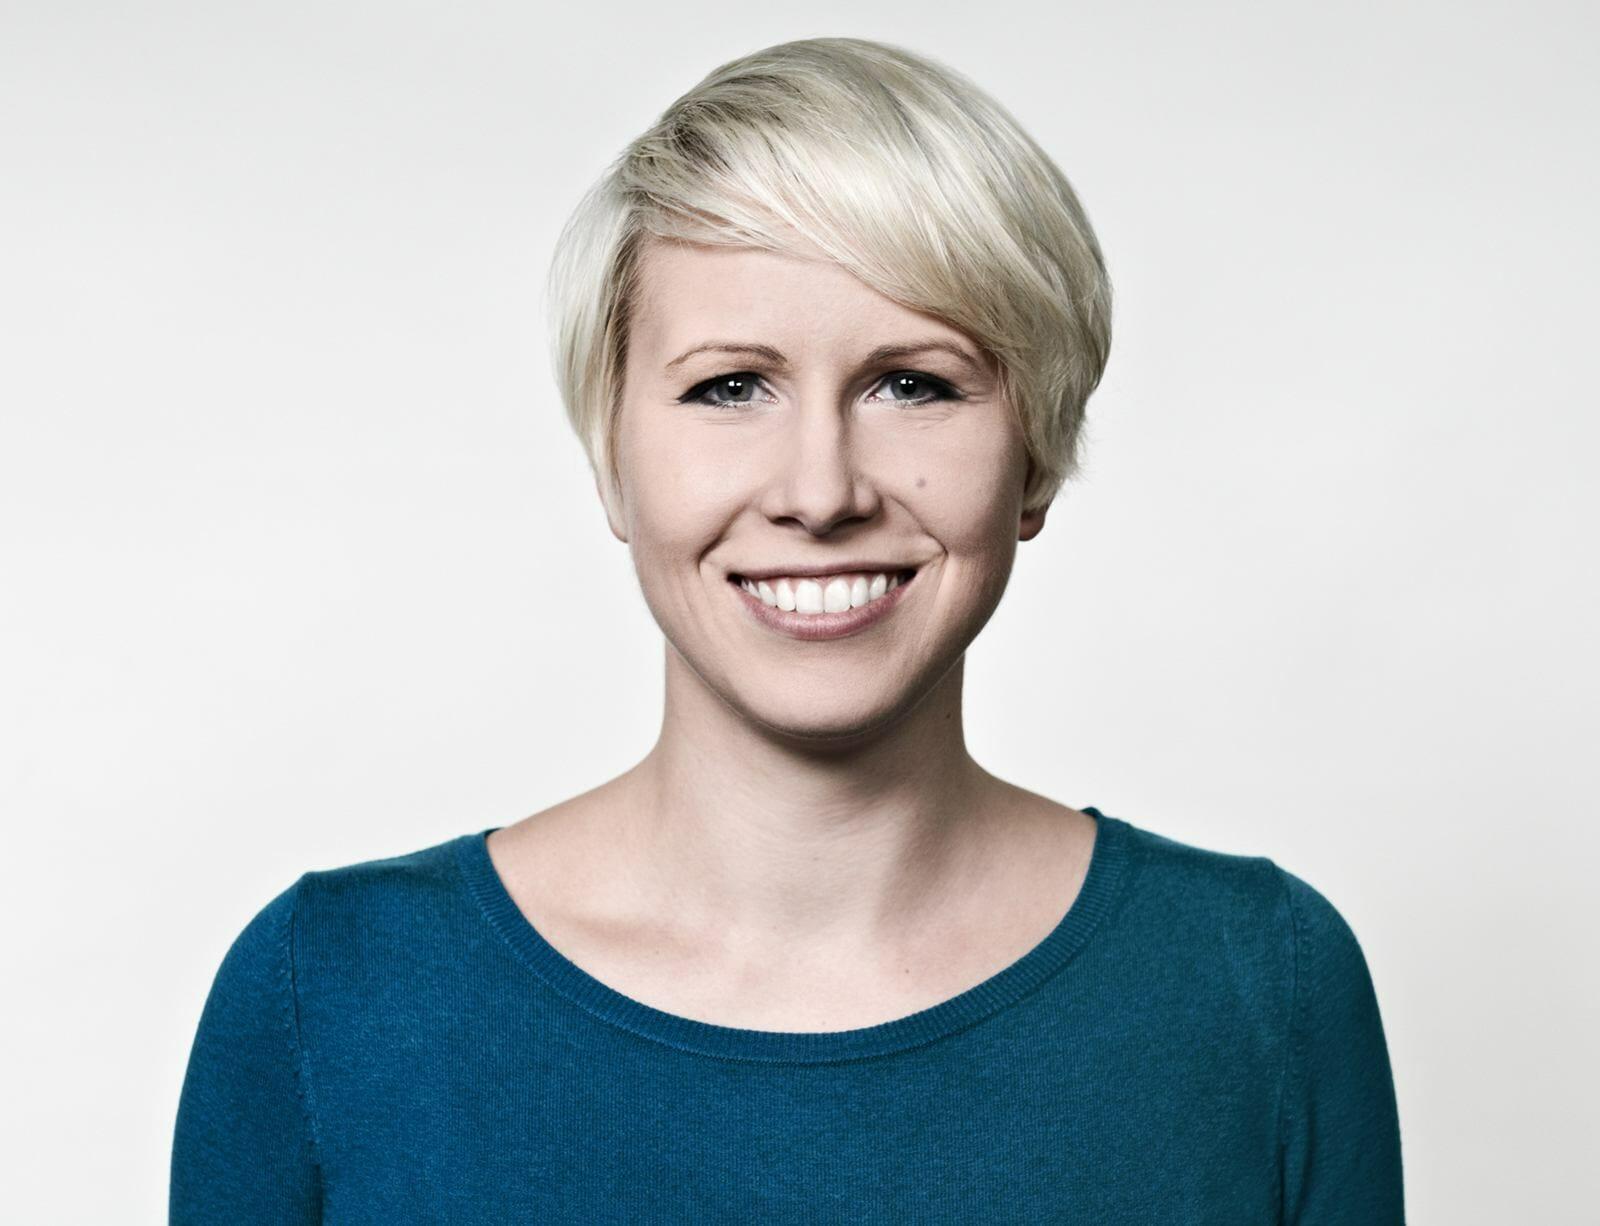 Miriam Rupp - CEO of Mashup Communications